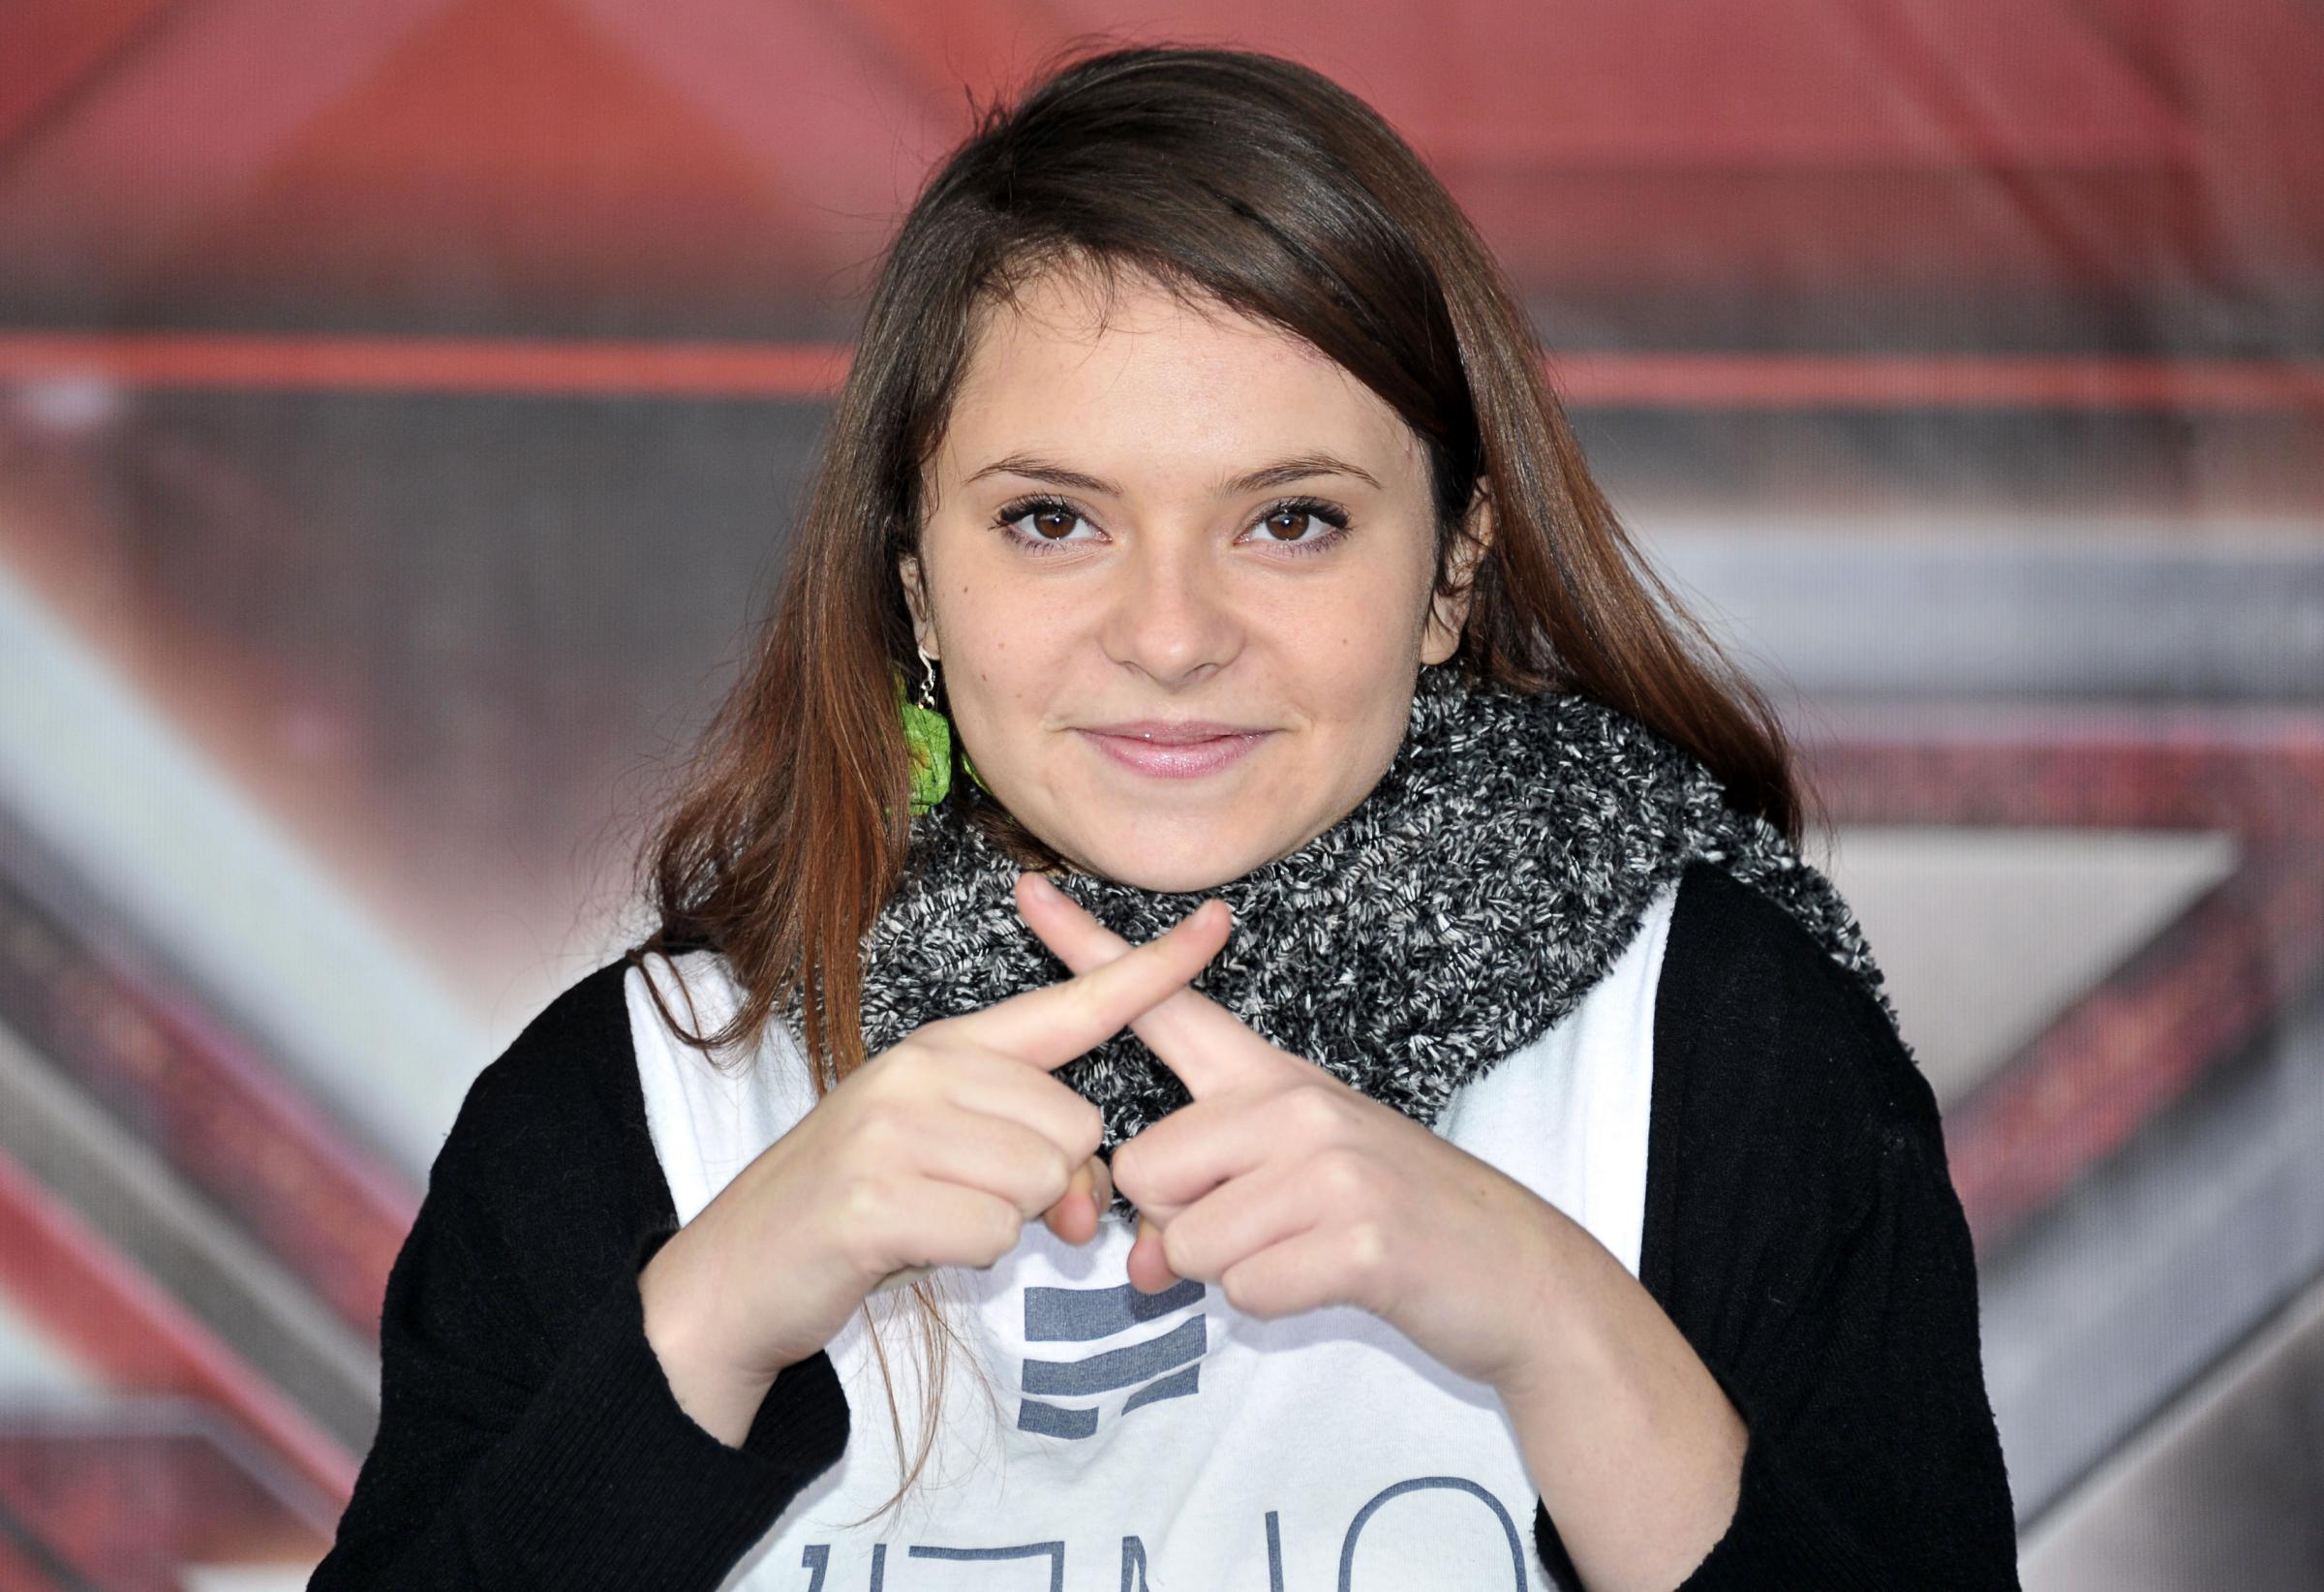 Francesca-Michielin-ha-vinto-X-Factor-5.jpg